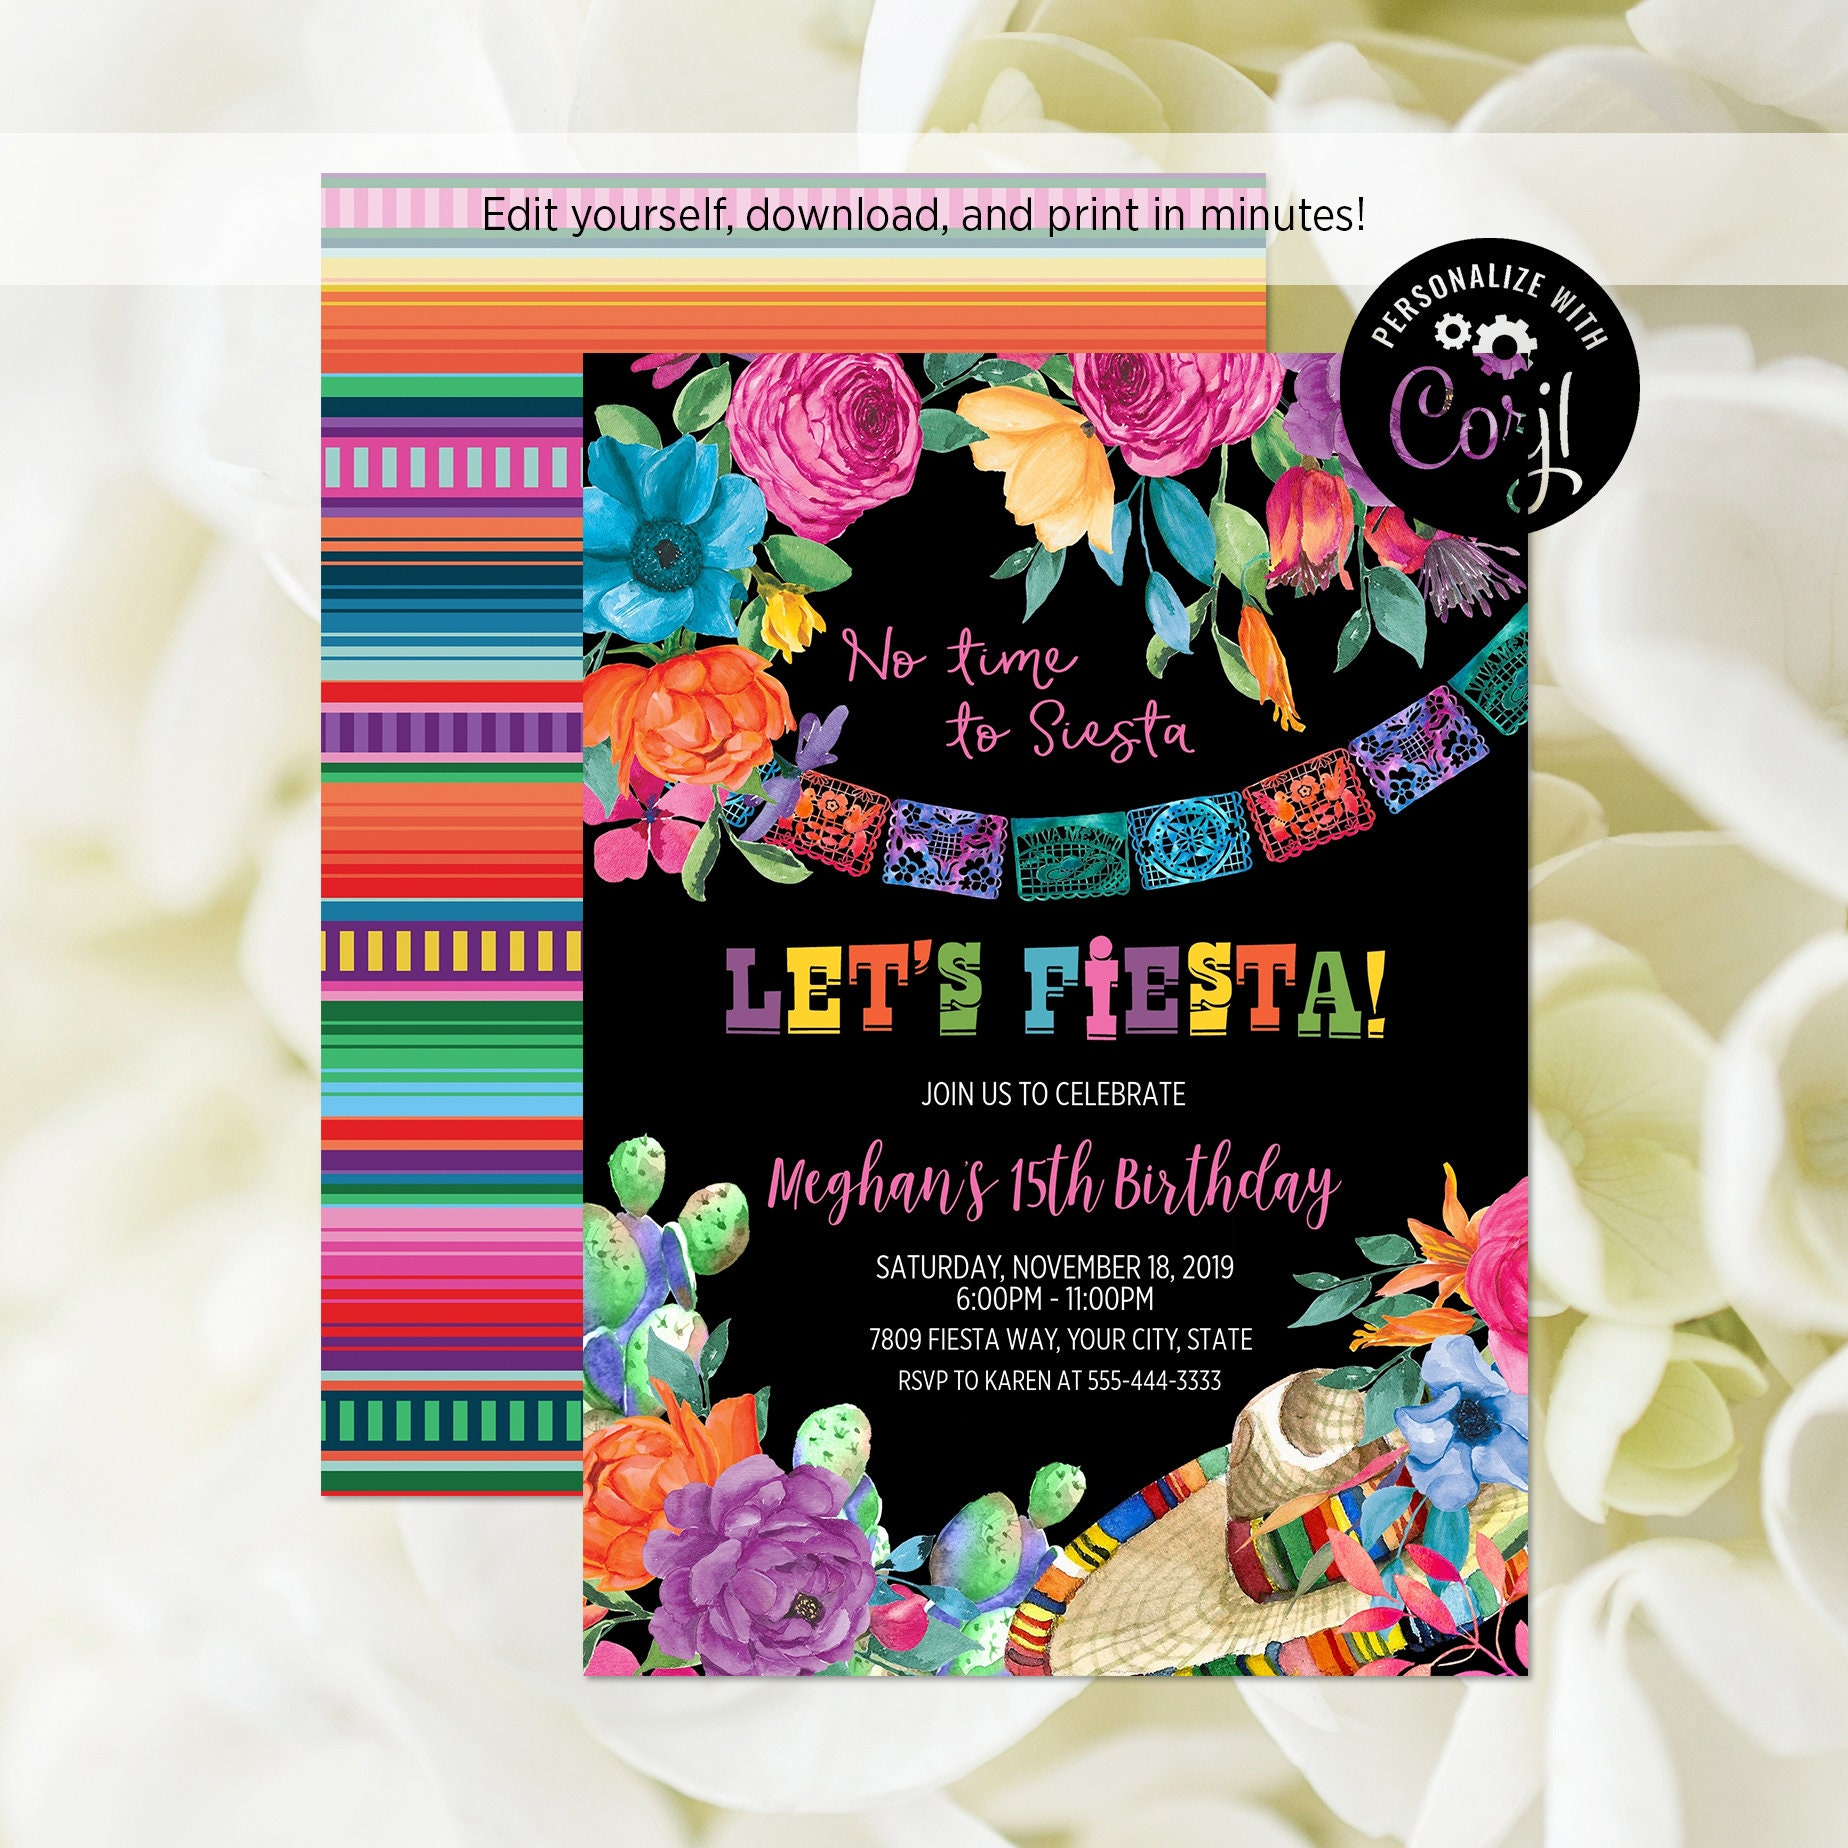 Editable File Fiesta Birthday Party Invitation Let S Fiesta Invitation Mexican Floral Birthday Invite Mexican Theme Corjl Template 353